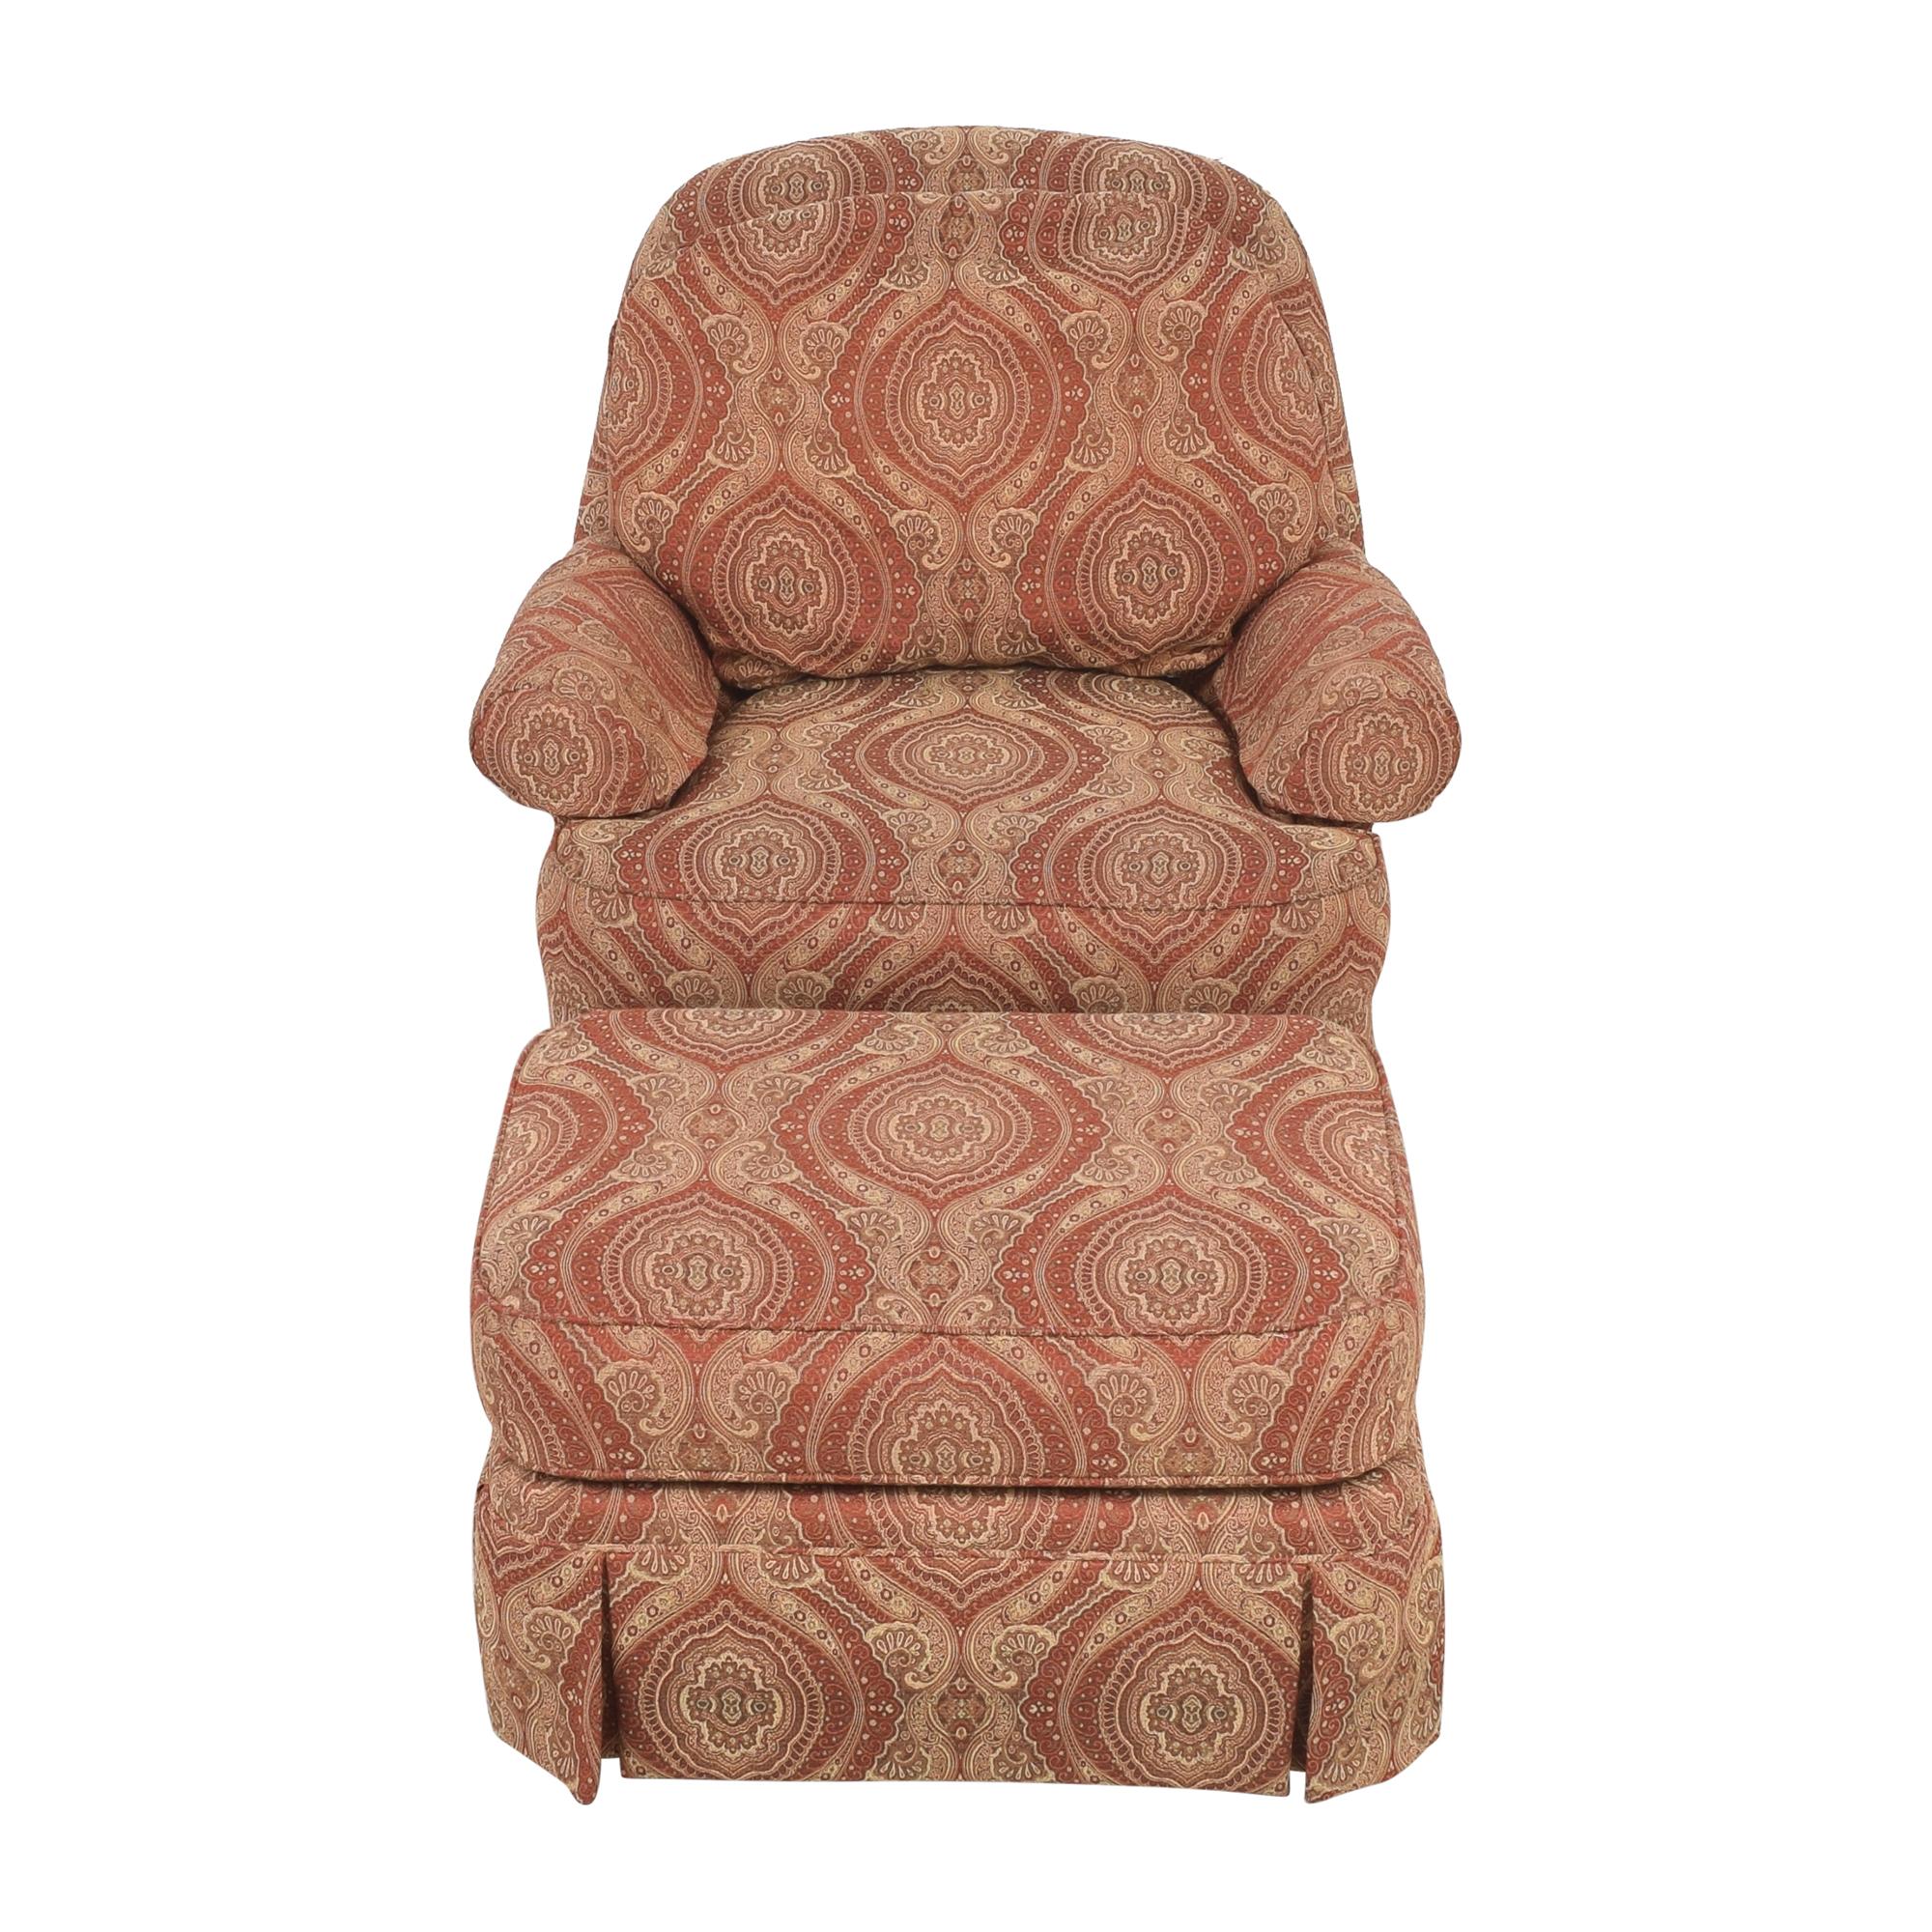 shop Ethan Allen Ethan Allen Swivel Chair with Ottoman online